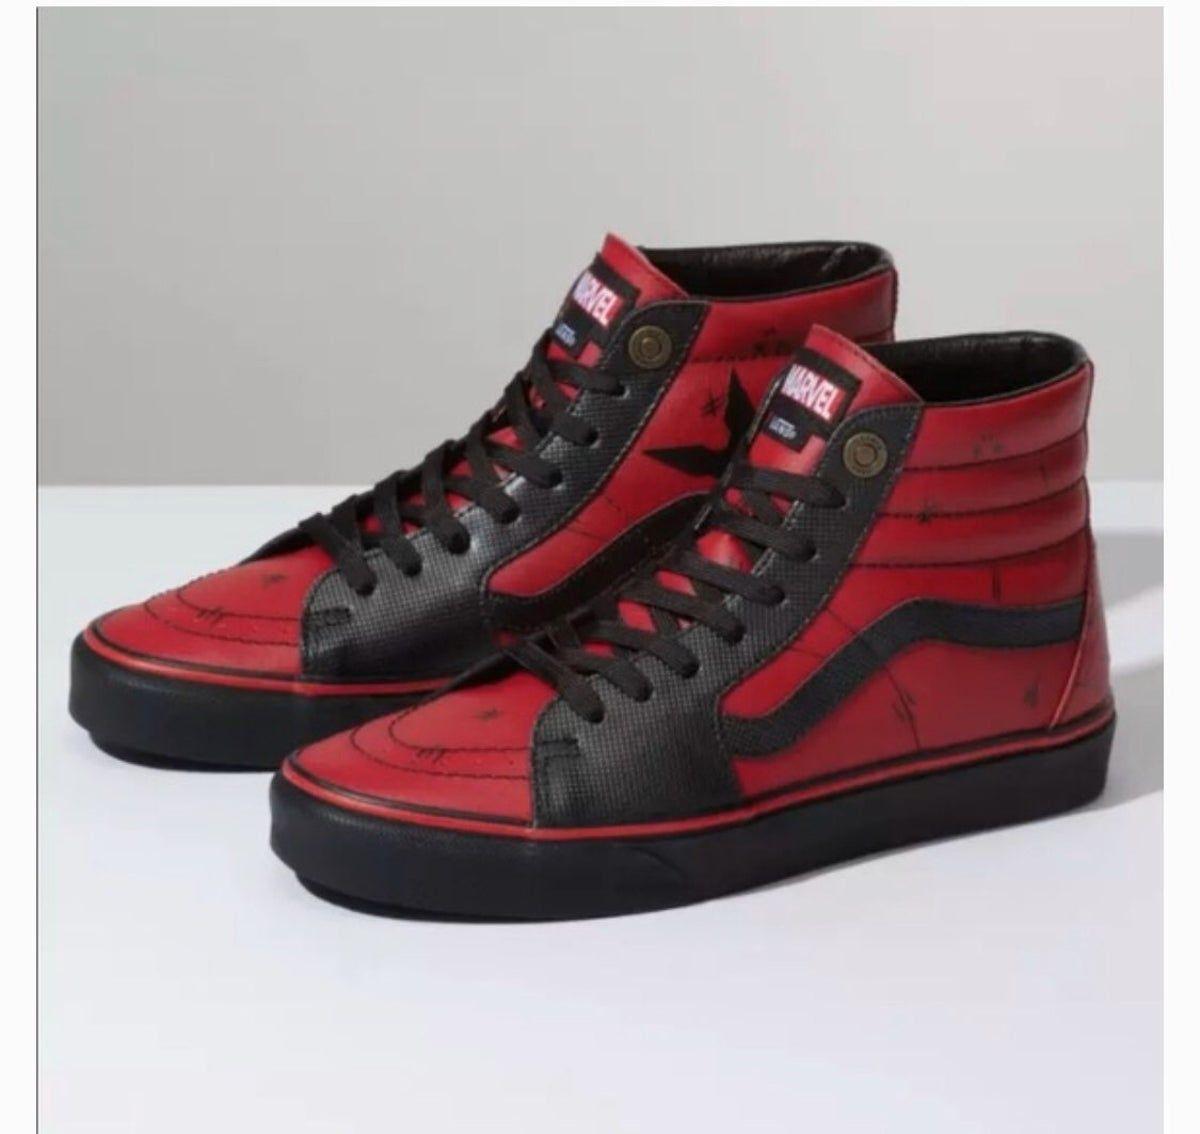 Vans x Marvel Sk8-Hi Deadpool Shoes on